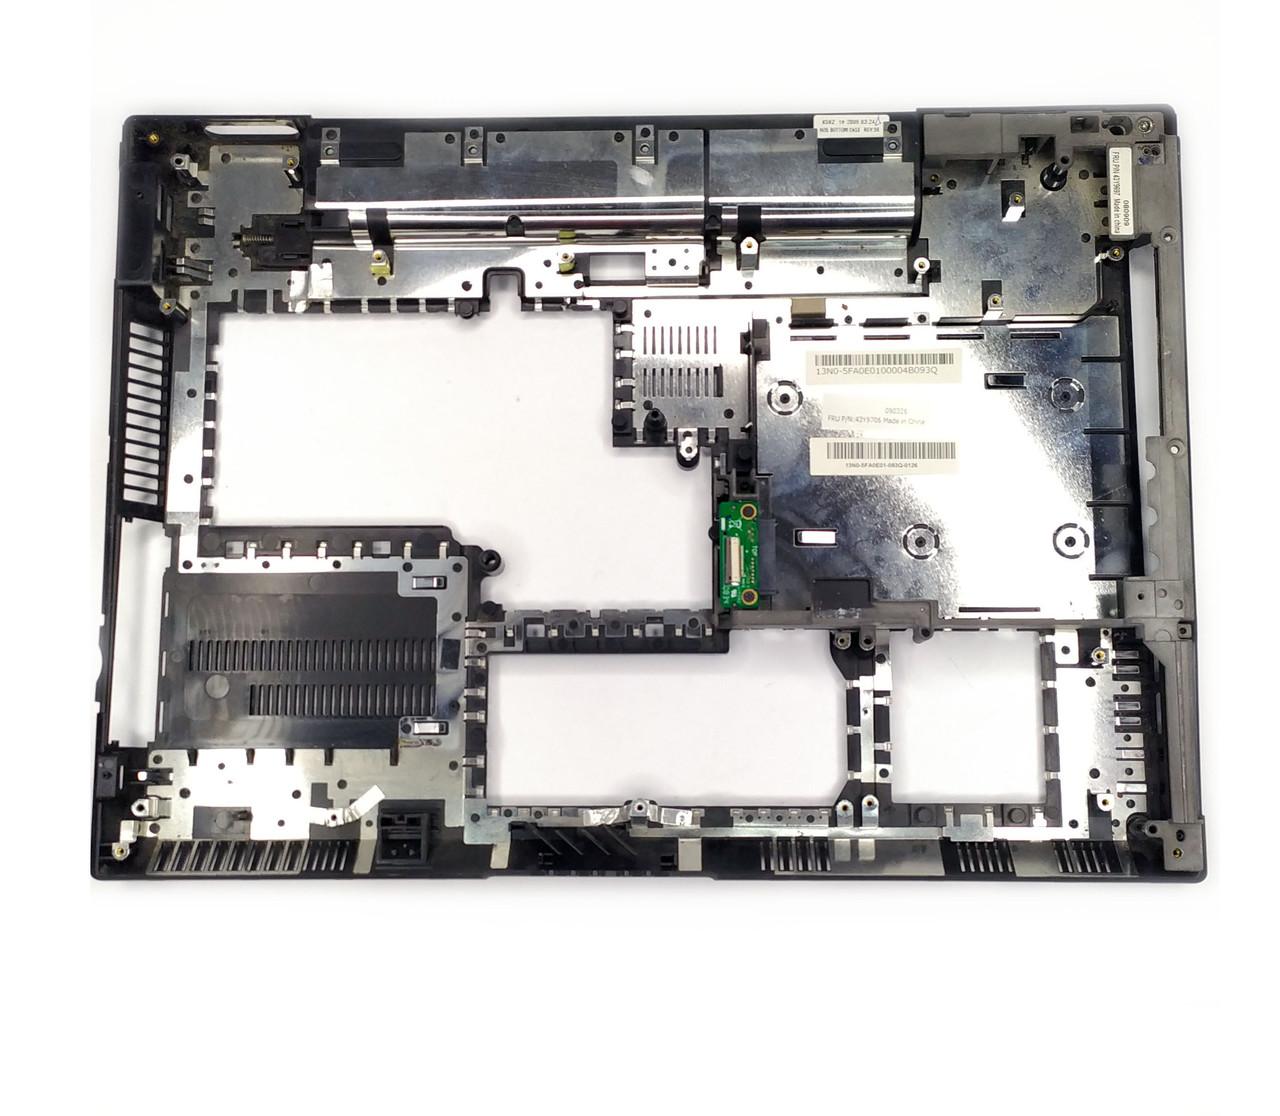 Корпус Корыто D cover (43Y9706) для ноутбука Lenovo ThinkPad SL500 2746